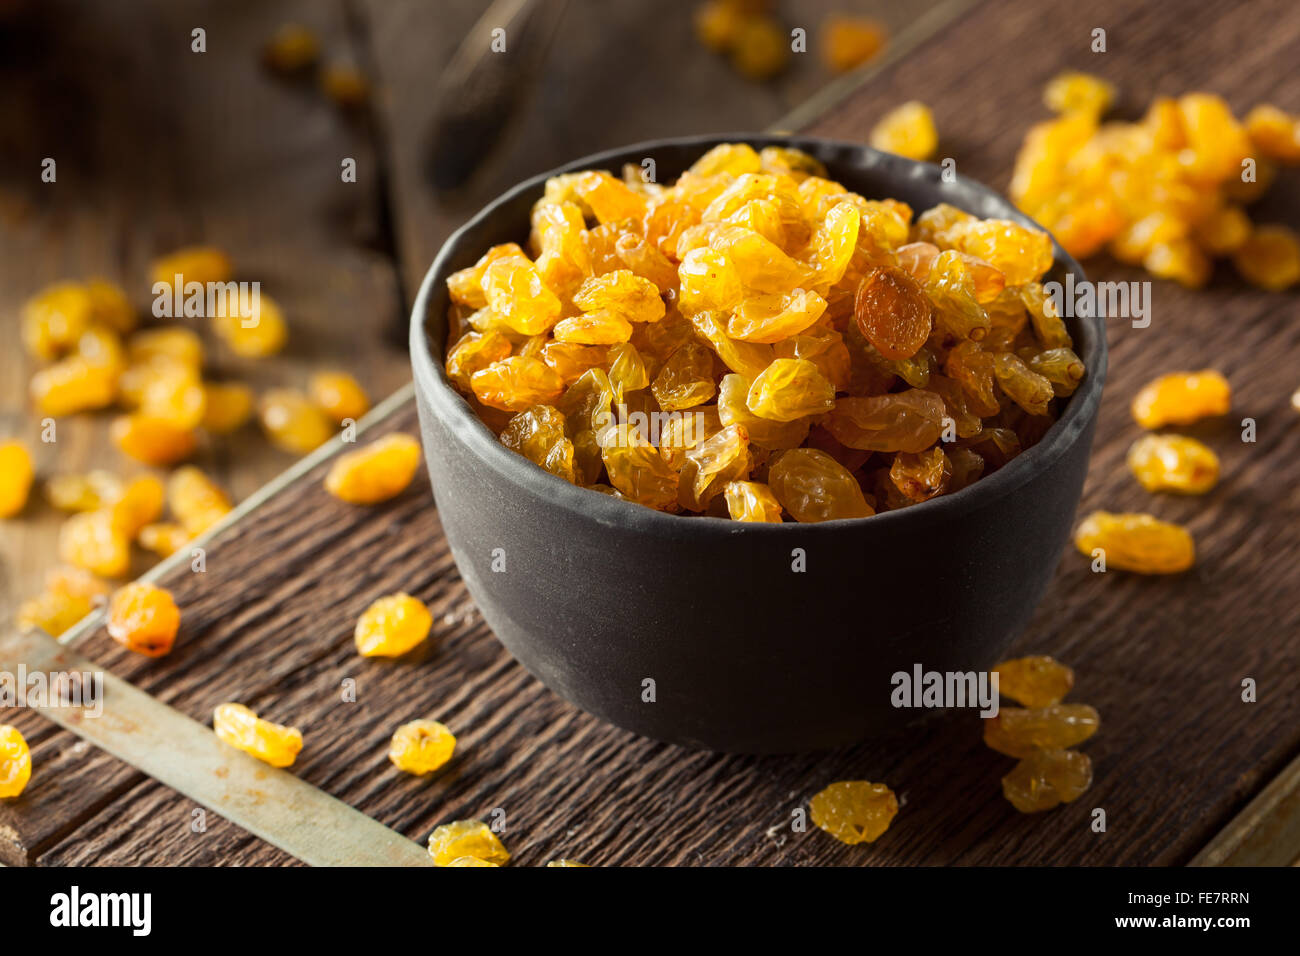 Séché bio Raisins secs dans un bol d'Or Banque D'Images